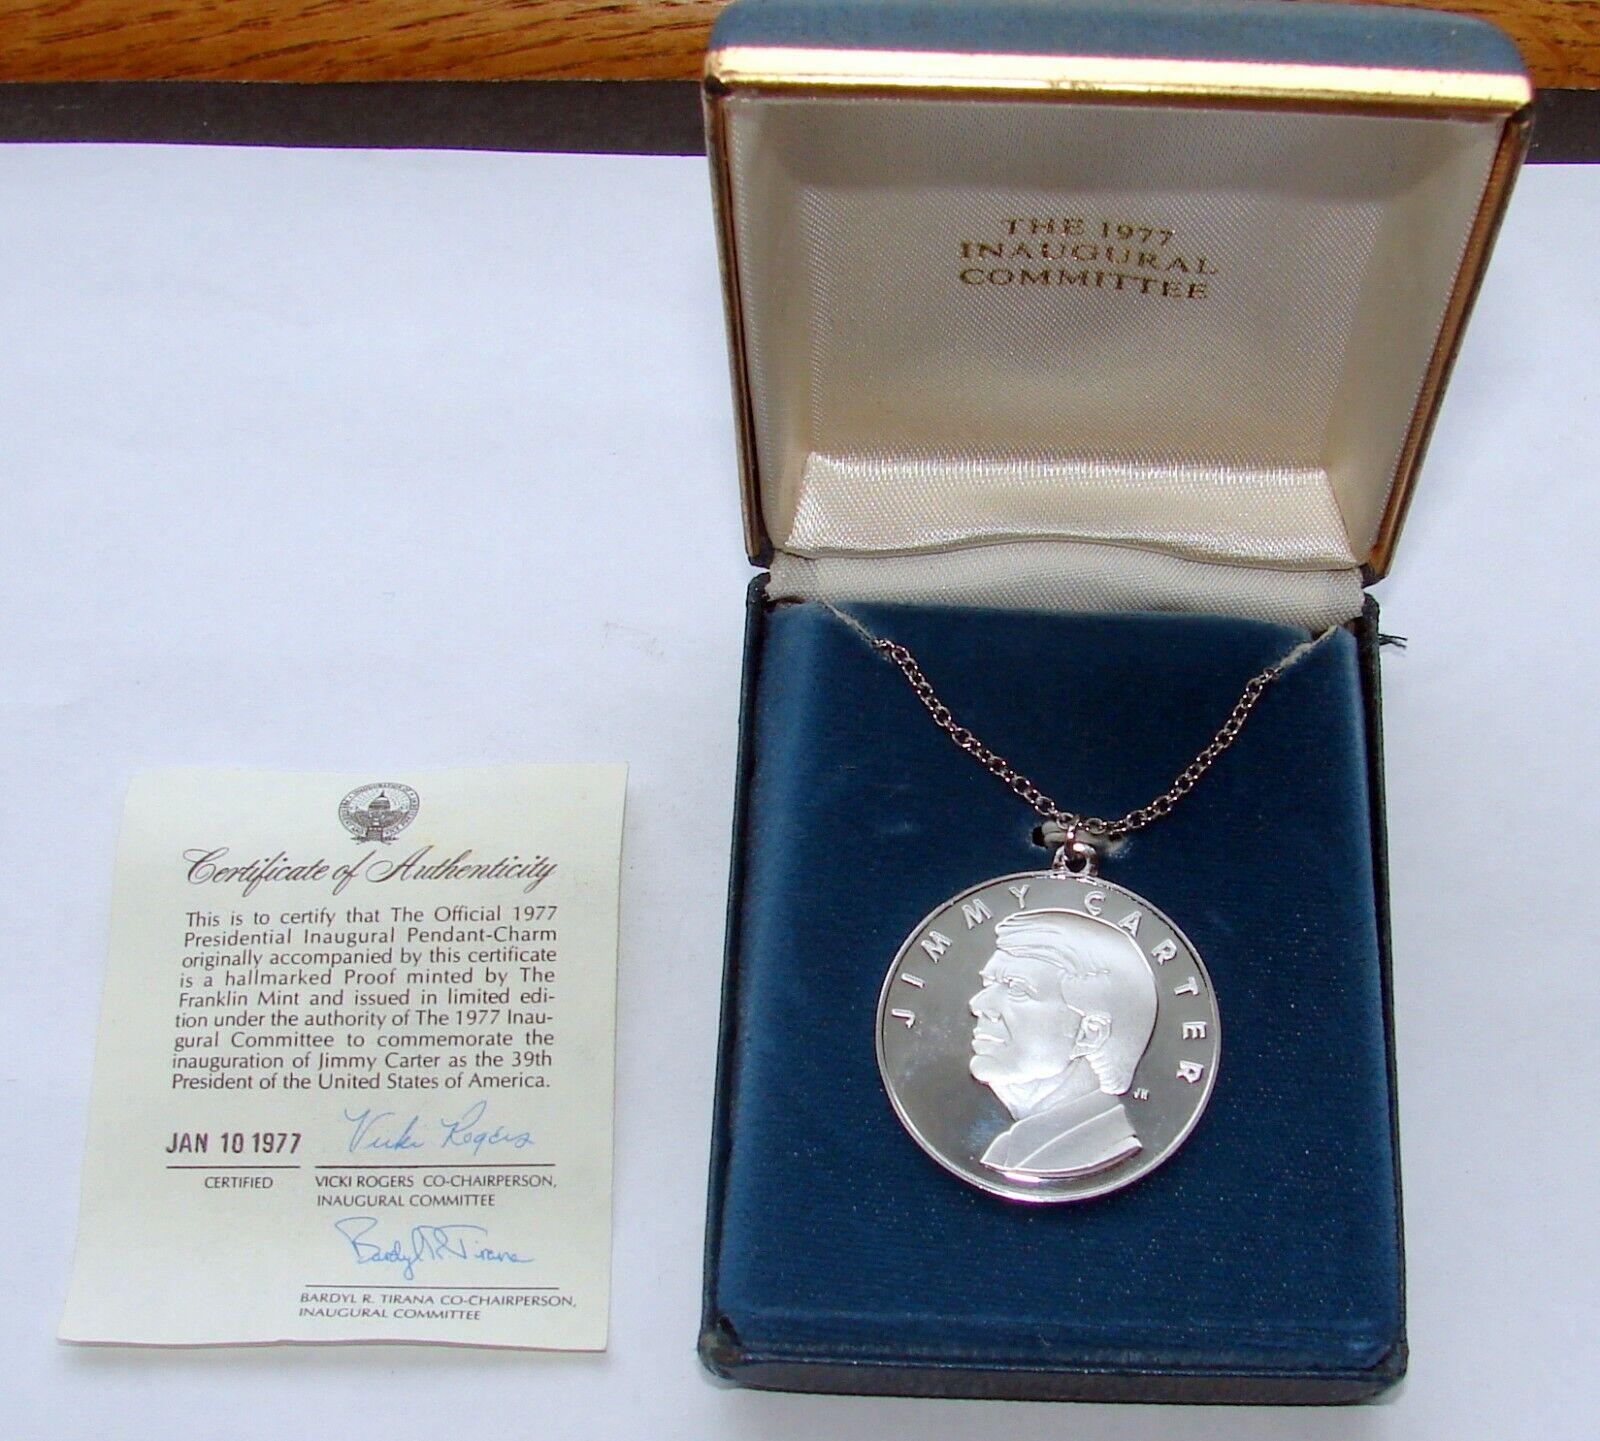 1977 FRANKLIN MINT JIMMY CARTER PROOF .999 SILVER MEDAL CHARM W/BOX CERT - $22.50